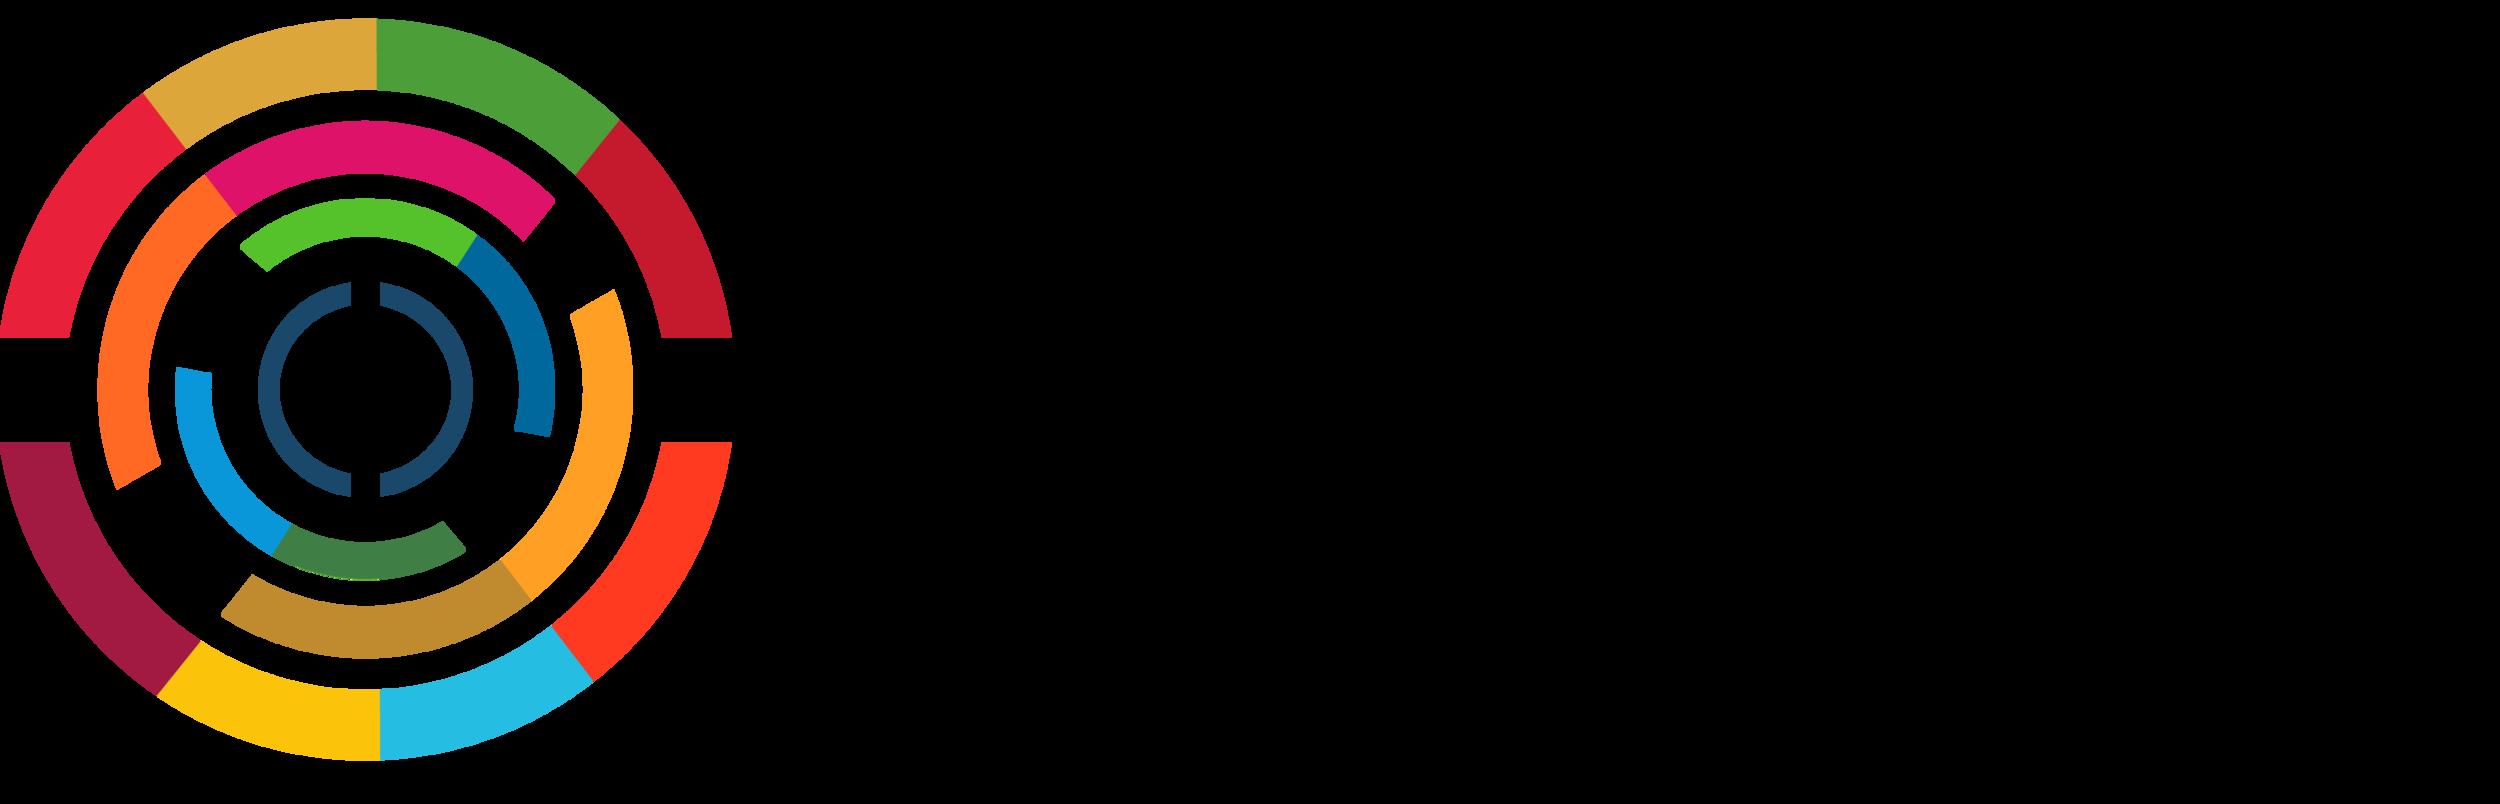 Vertical logo - standard.png